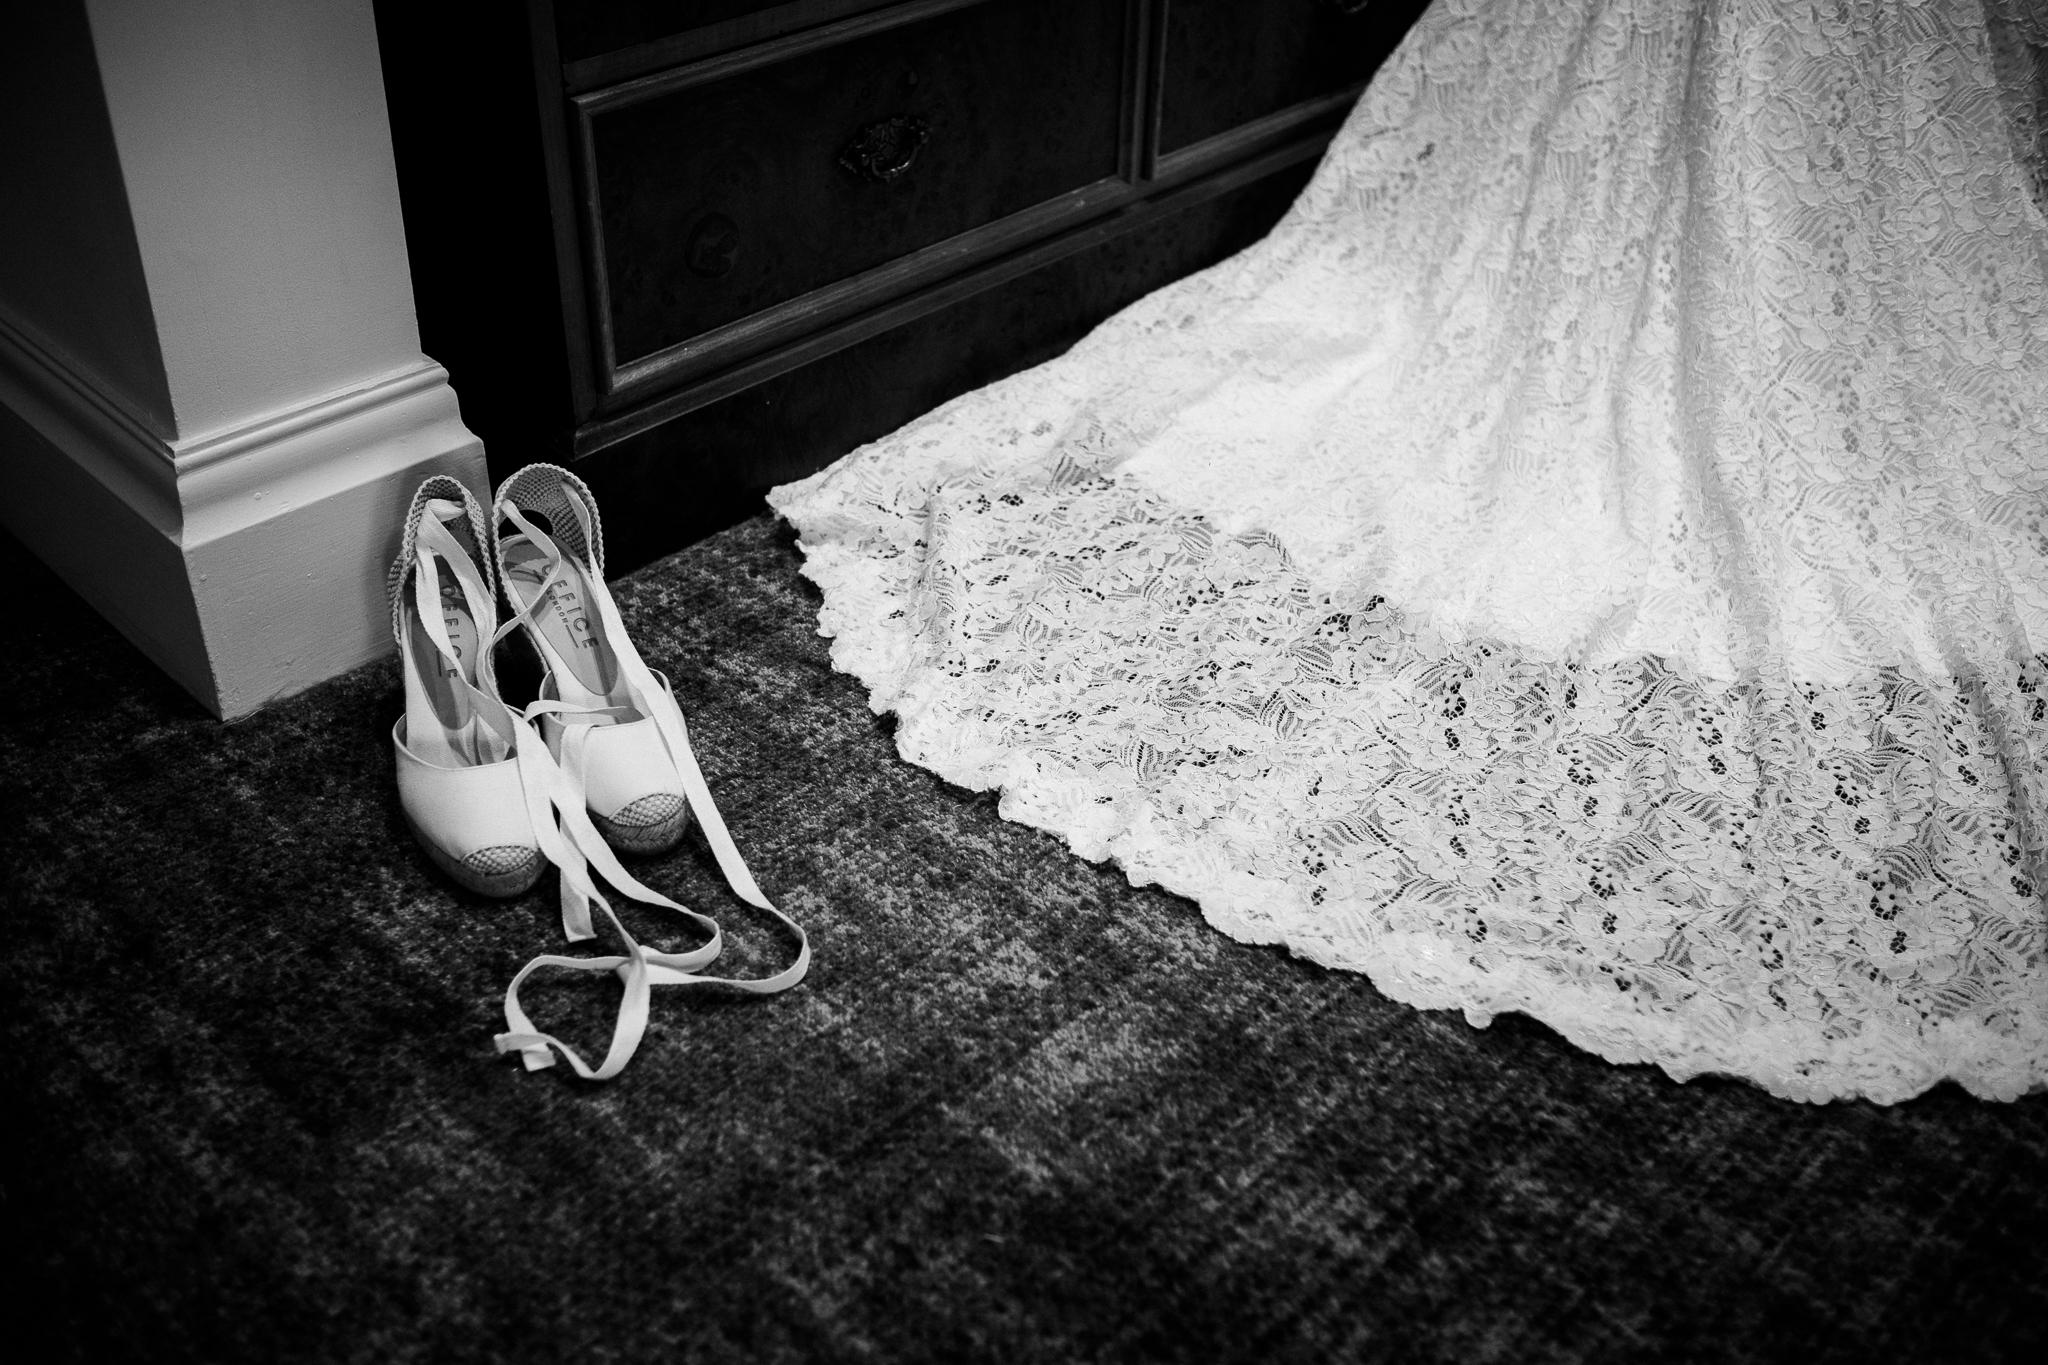 Relaxed Documentary Wedding Photography at The Wizard Inn, Alderley Edge Cheshire - Jenny Harper-4.jpg